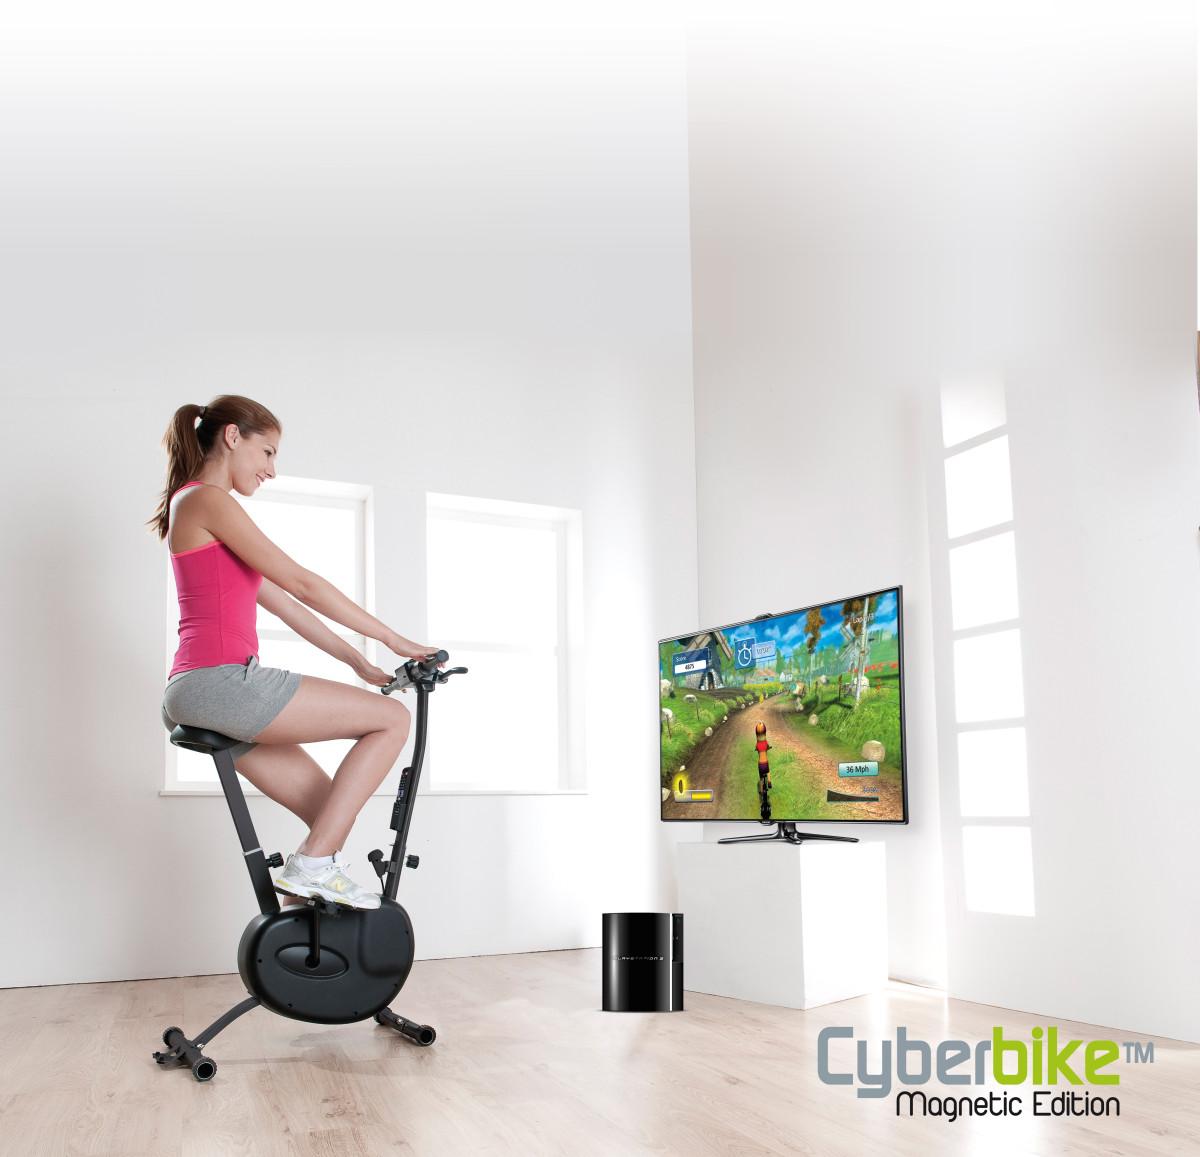 Ciberbike-jugar-ps3